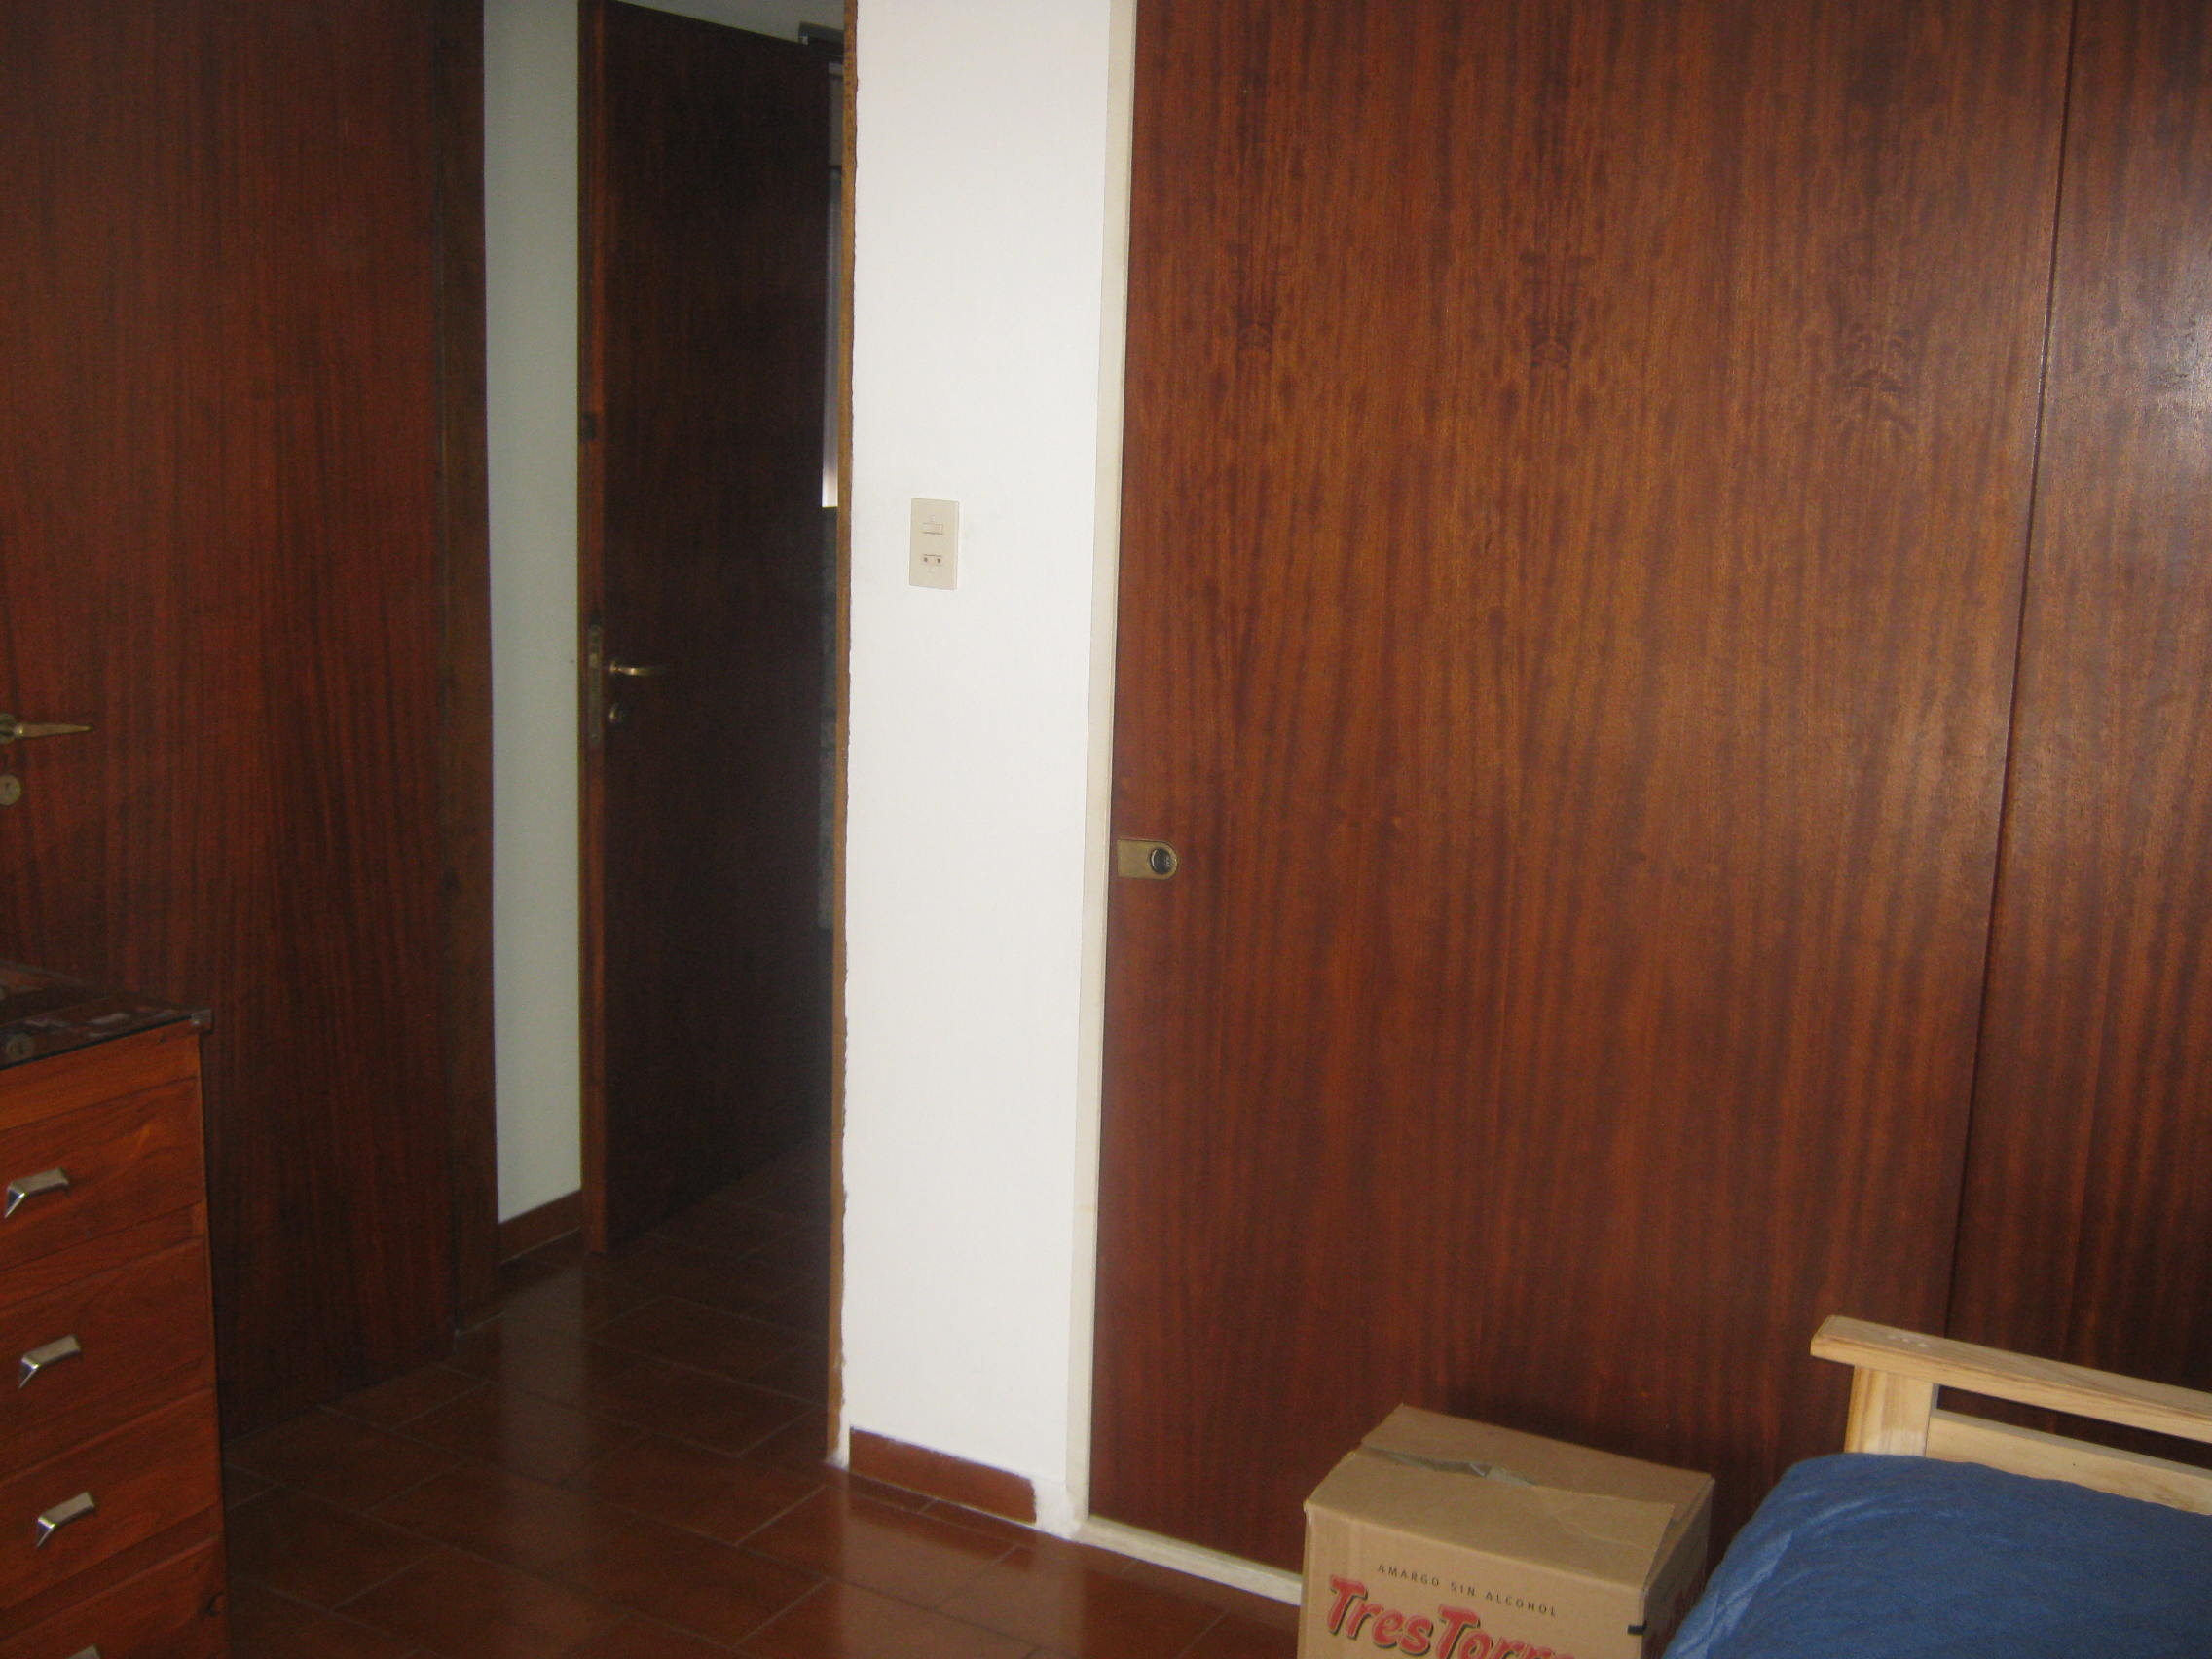 placard_habitación_fondo